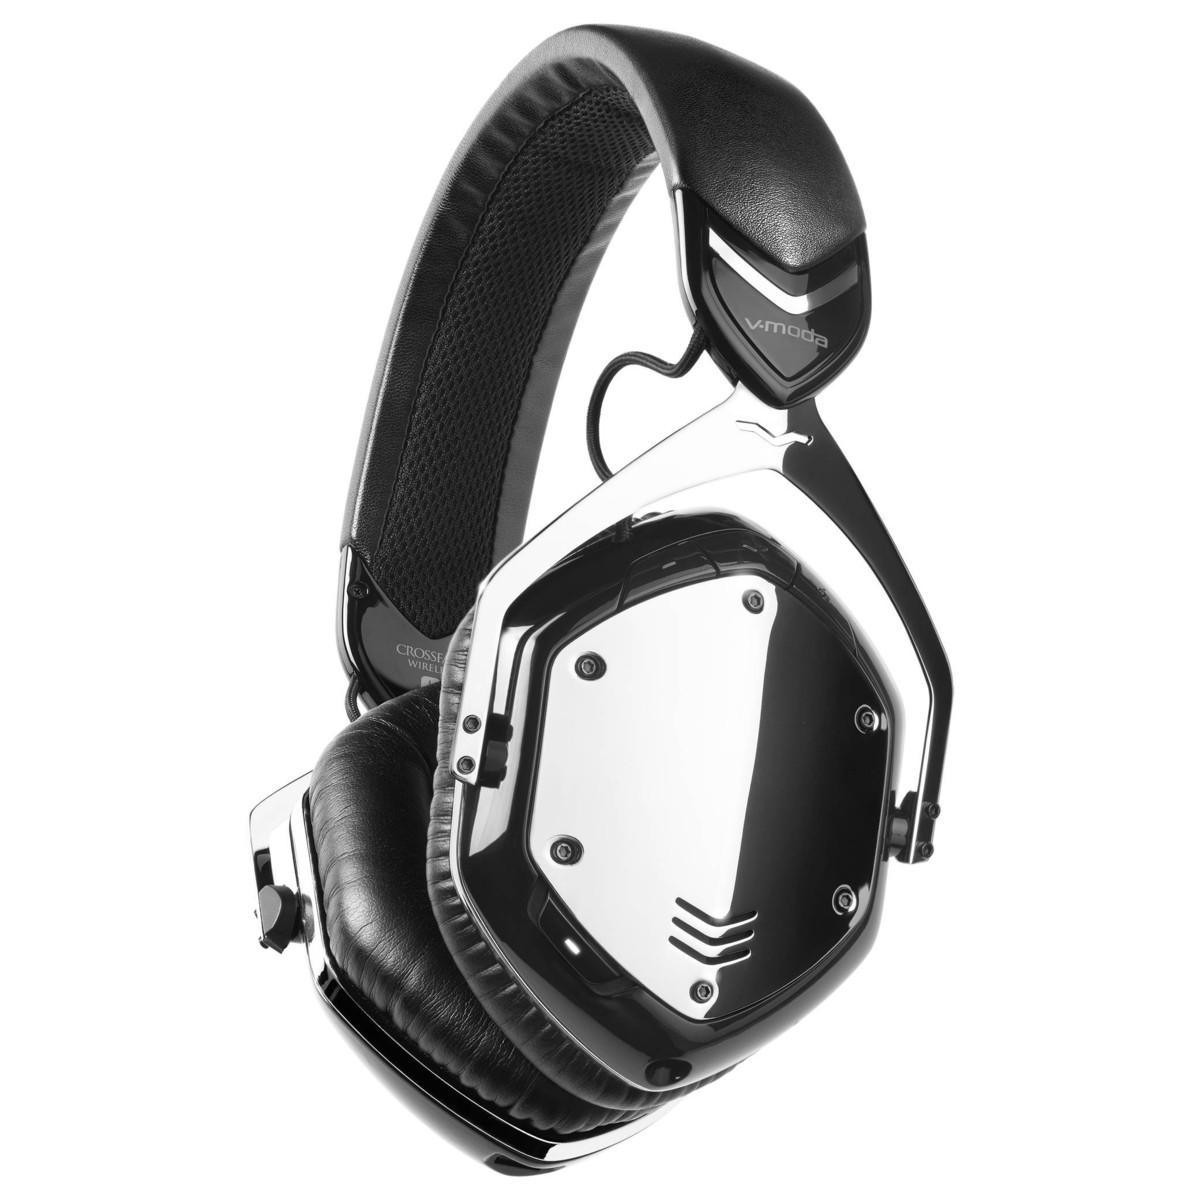 c0f3aaa713bd13 Loading zoom. V-Moda Crossfade Wireless Monitoring Bluetooth Monitoring  Headphones - Full Contents